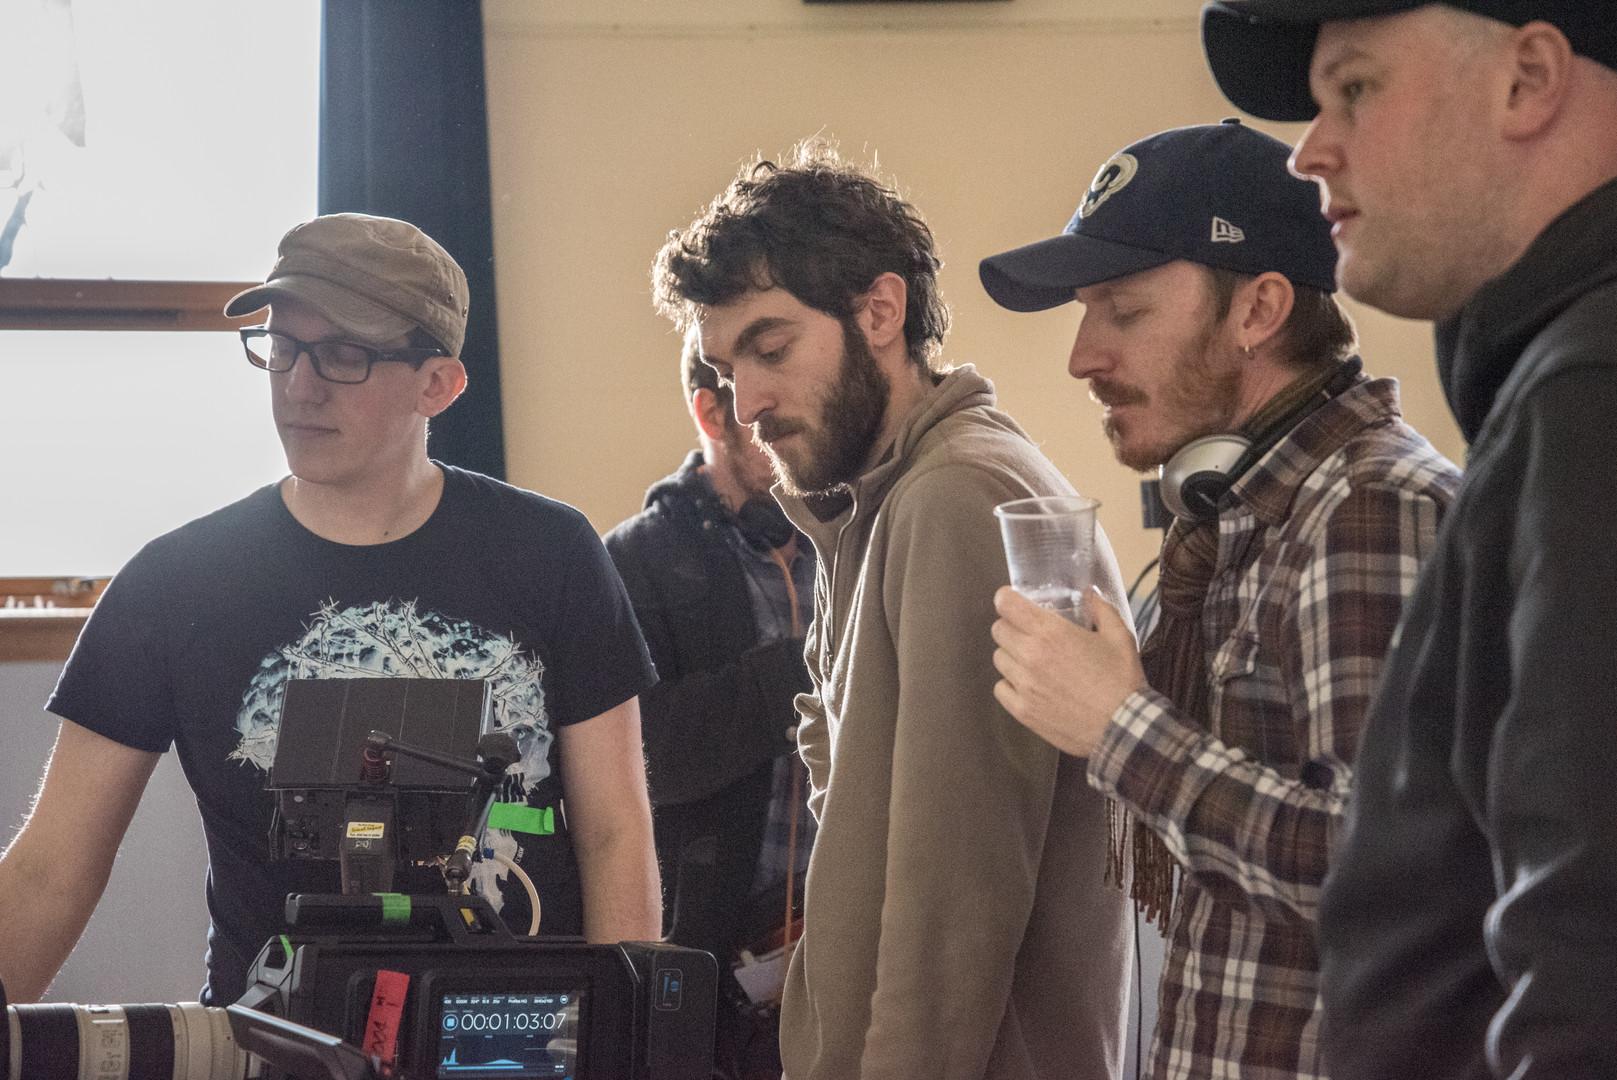 Paul Forrest (Focus Puller), Carlo D'Alessandro (DoP) & Stuart Cadenhead (AD) on the set of 'Natalie'.